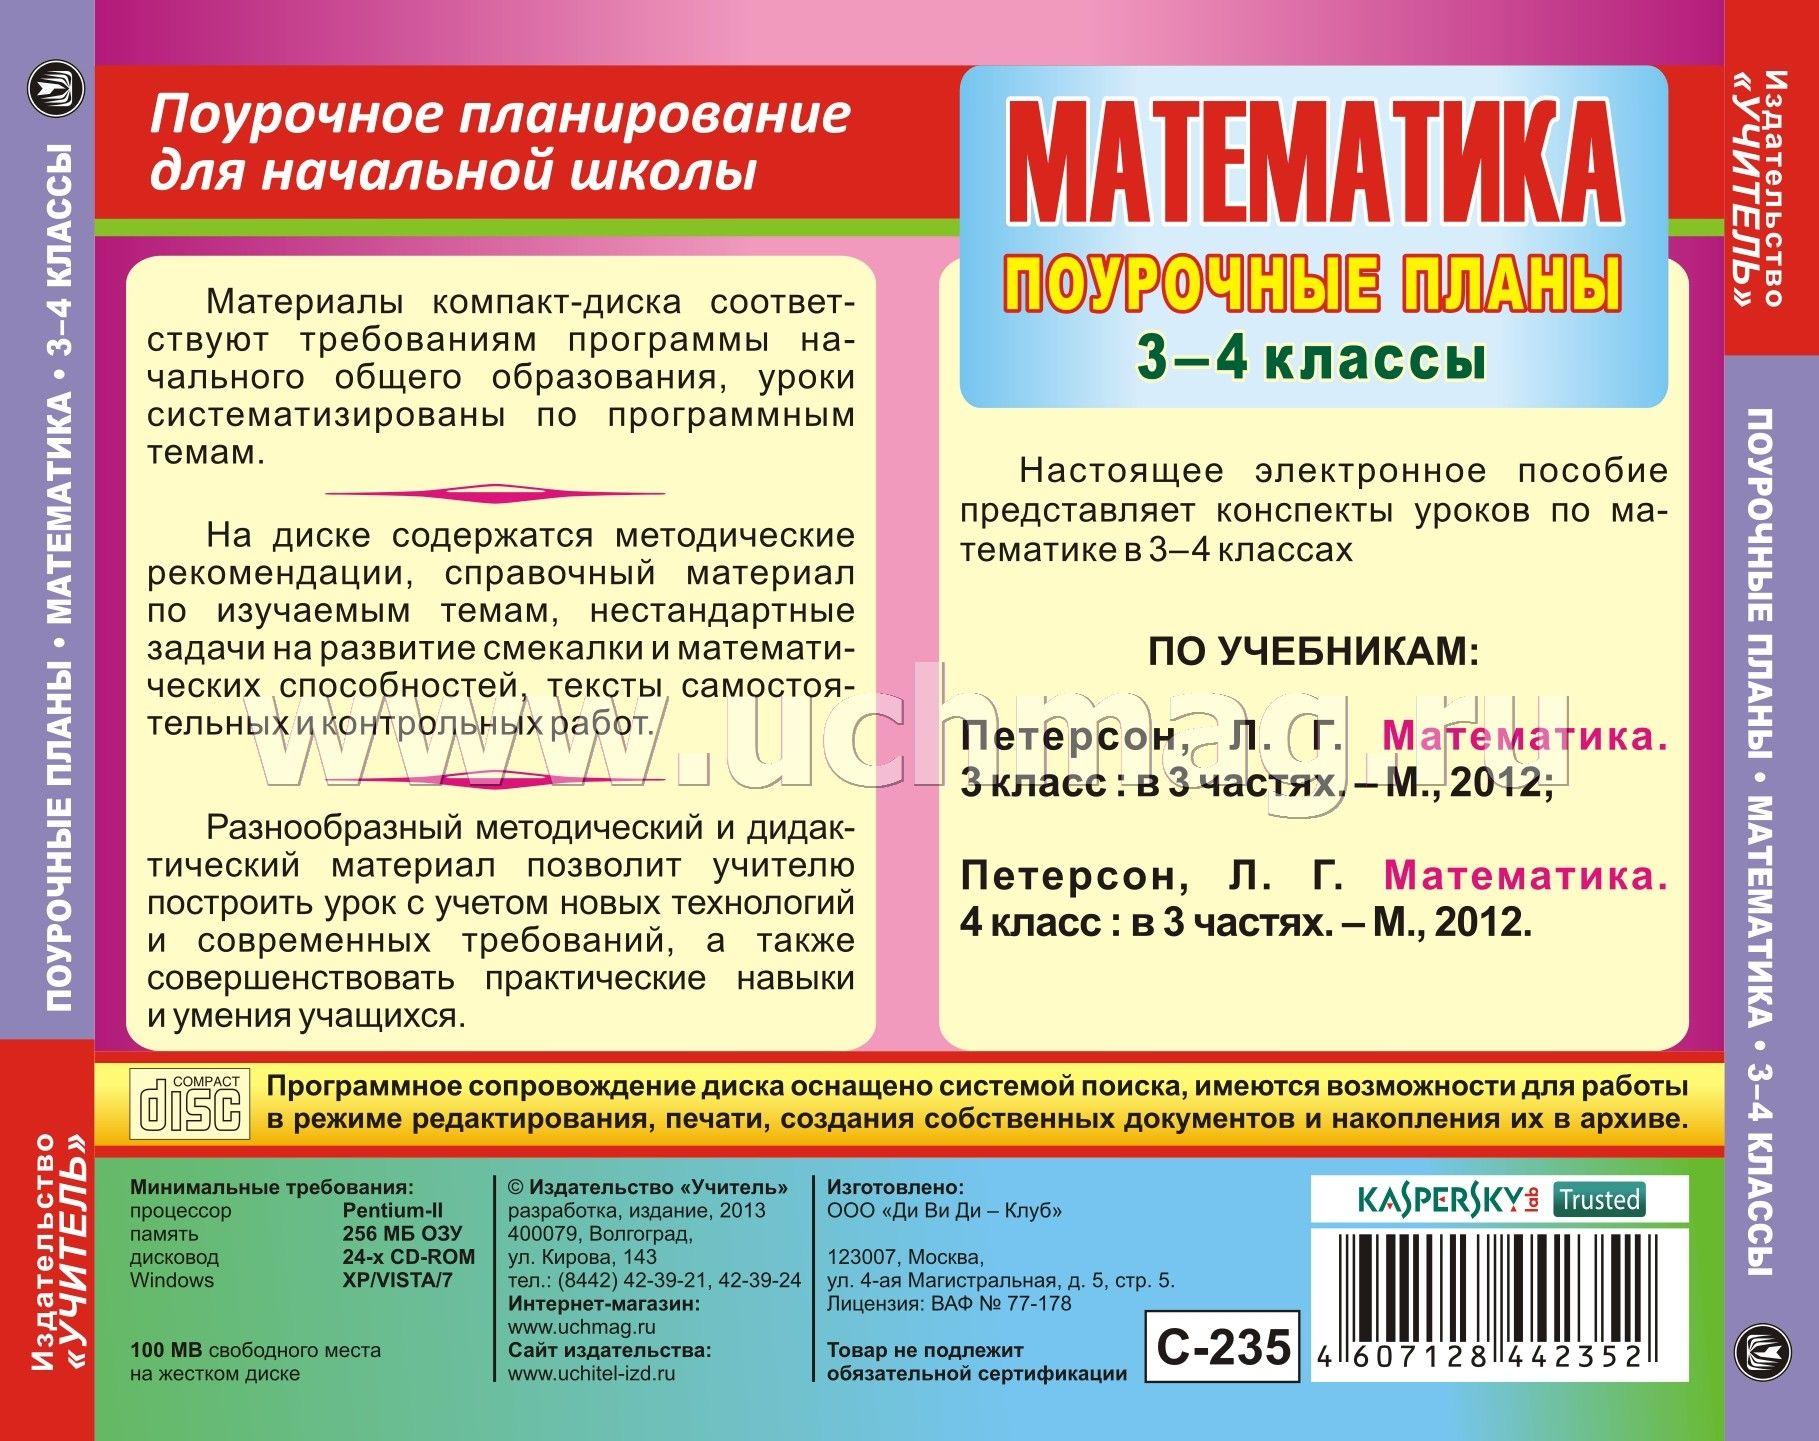 Диски тесты по математике 4 класс программа